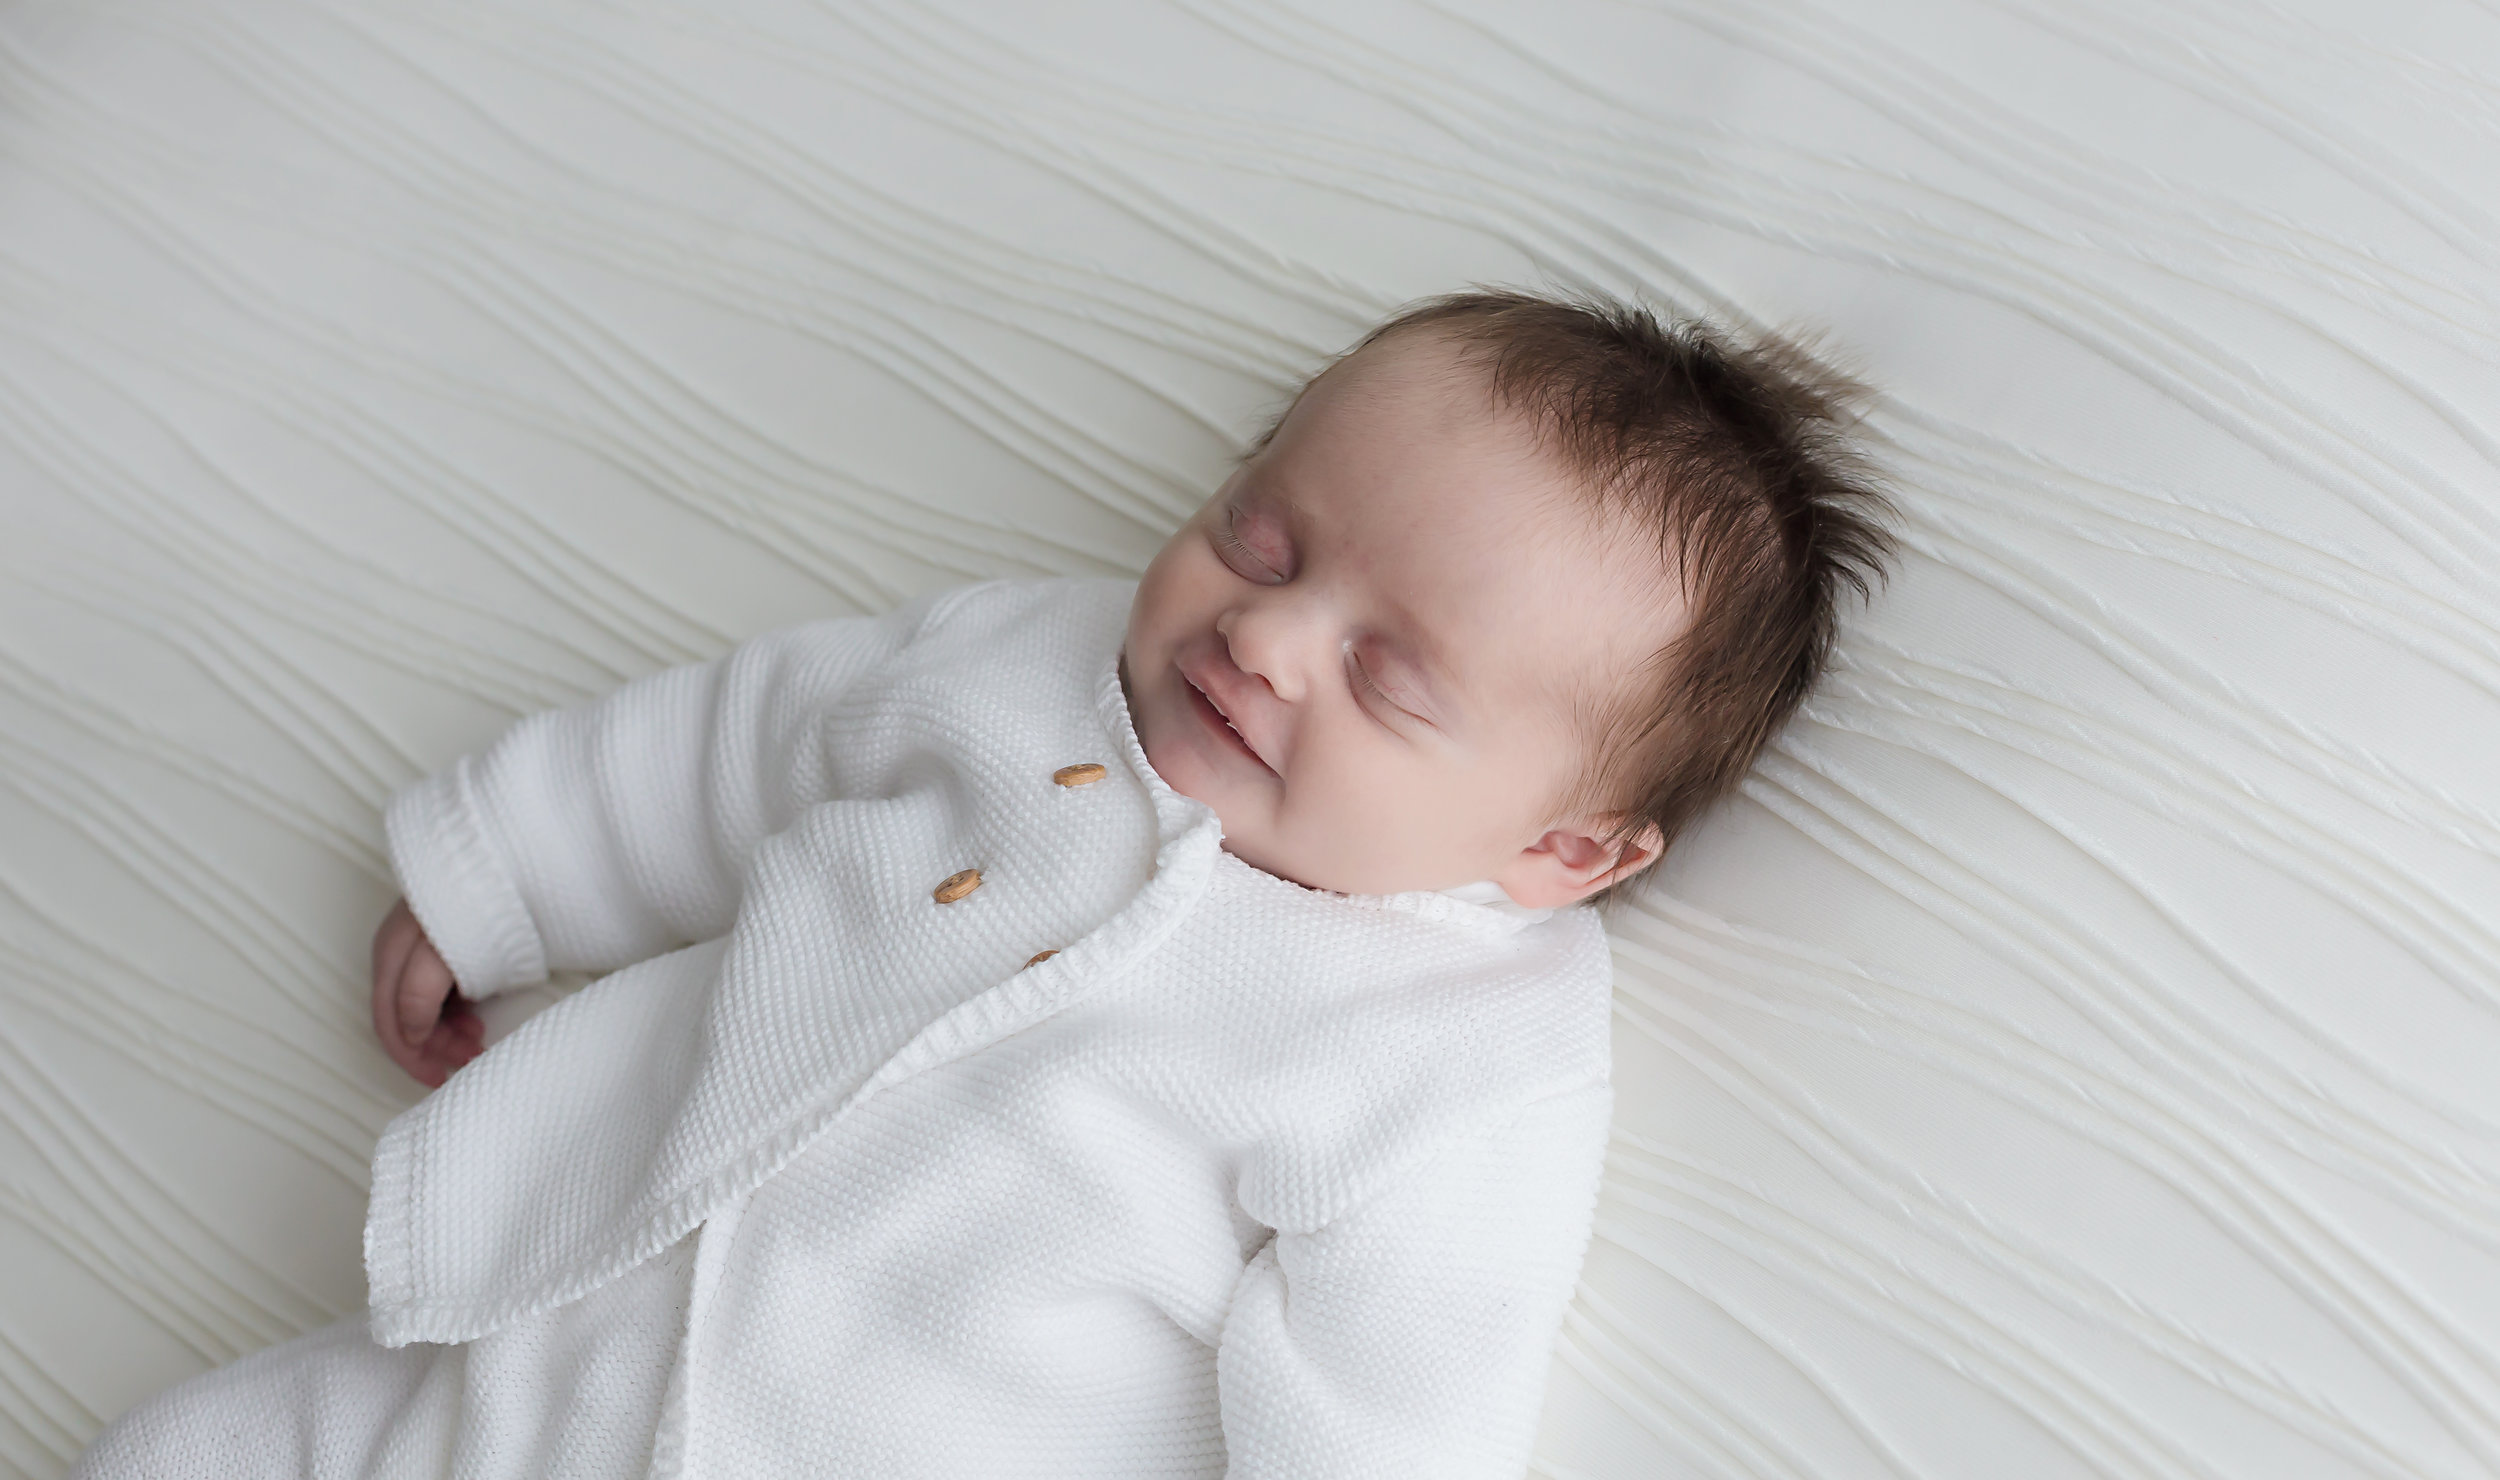 Danirosephotography.newbornphotographeraberdeen.minisession.jpg